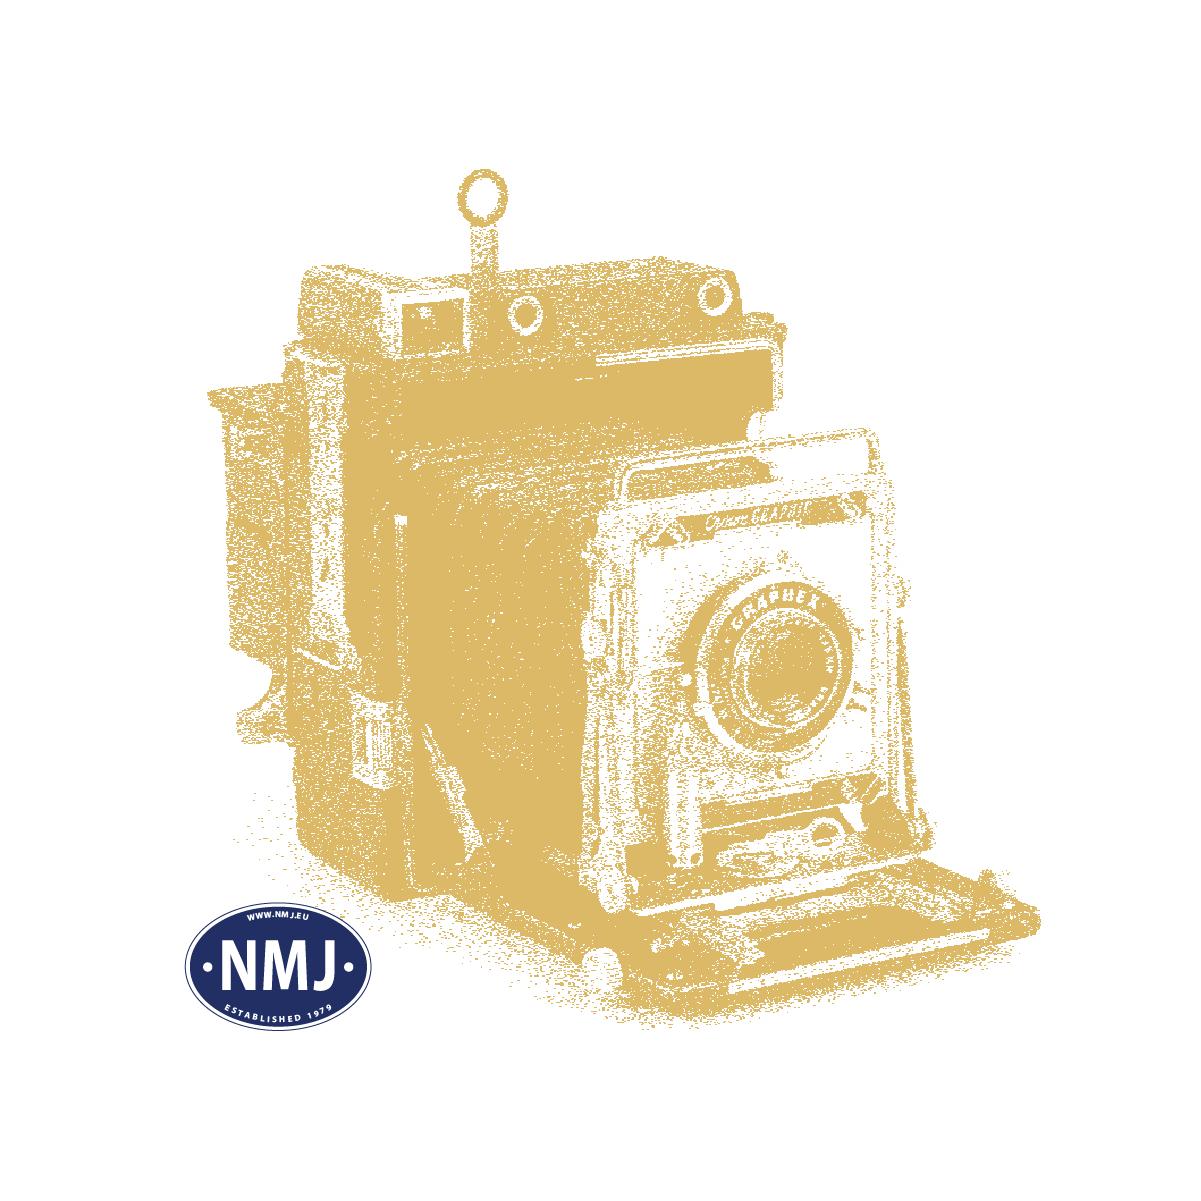 NMJT84.103L - NMJ Topline NSB BM69A.014, DCC Digital w/Interior Lightning